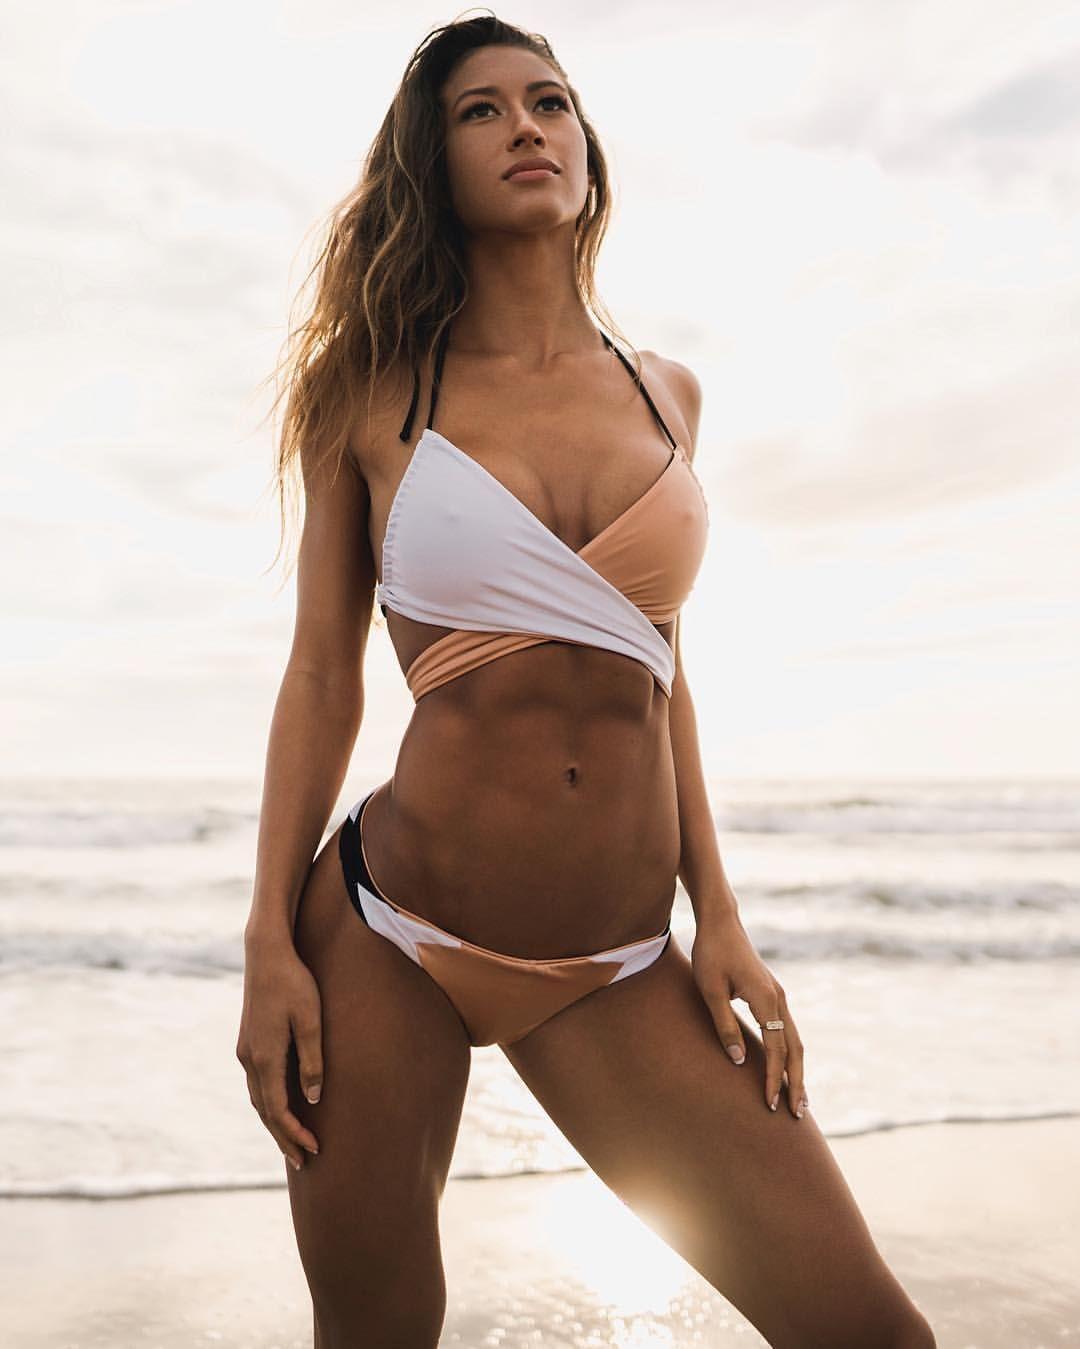 Celebrity Karina Elle nude photos 2019